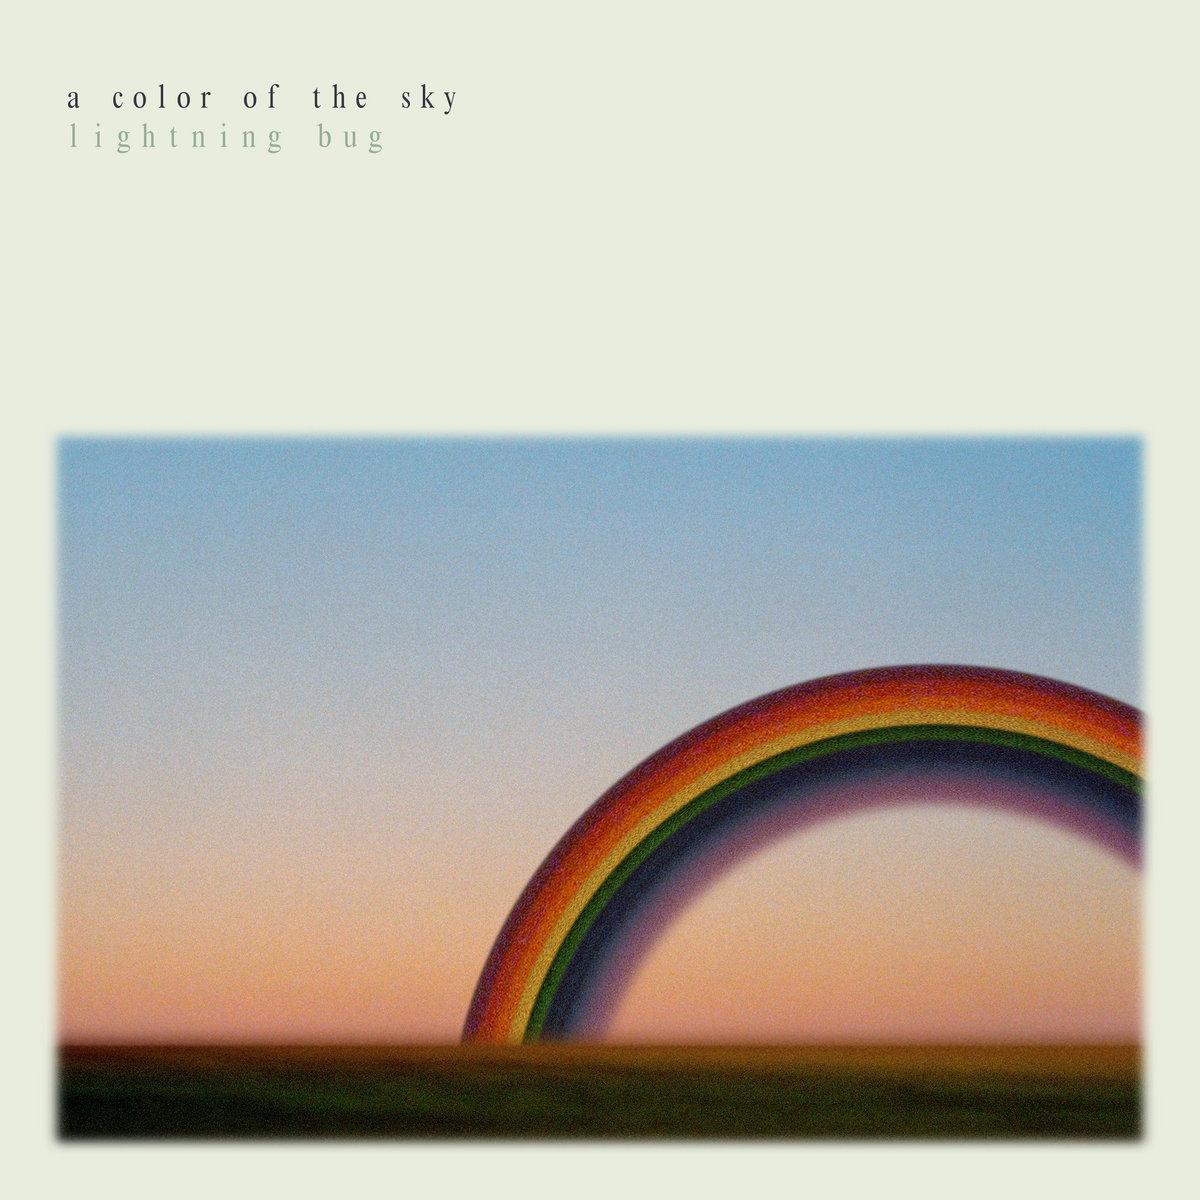 Lightning Bug Album Cover